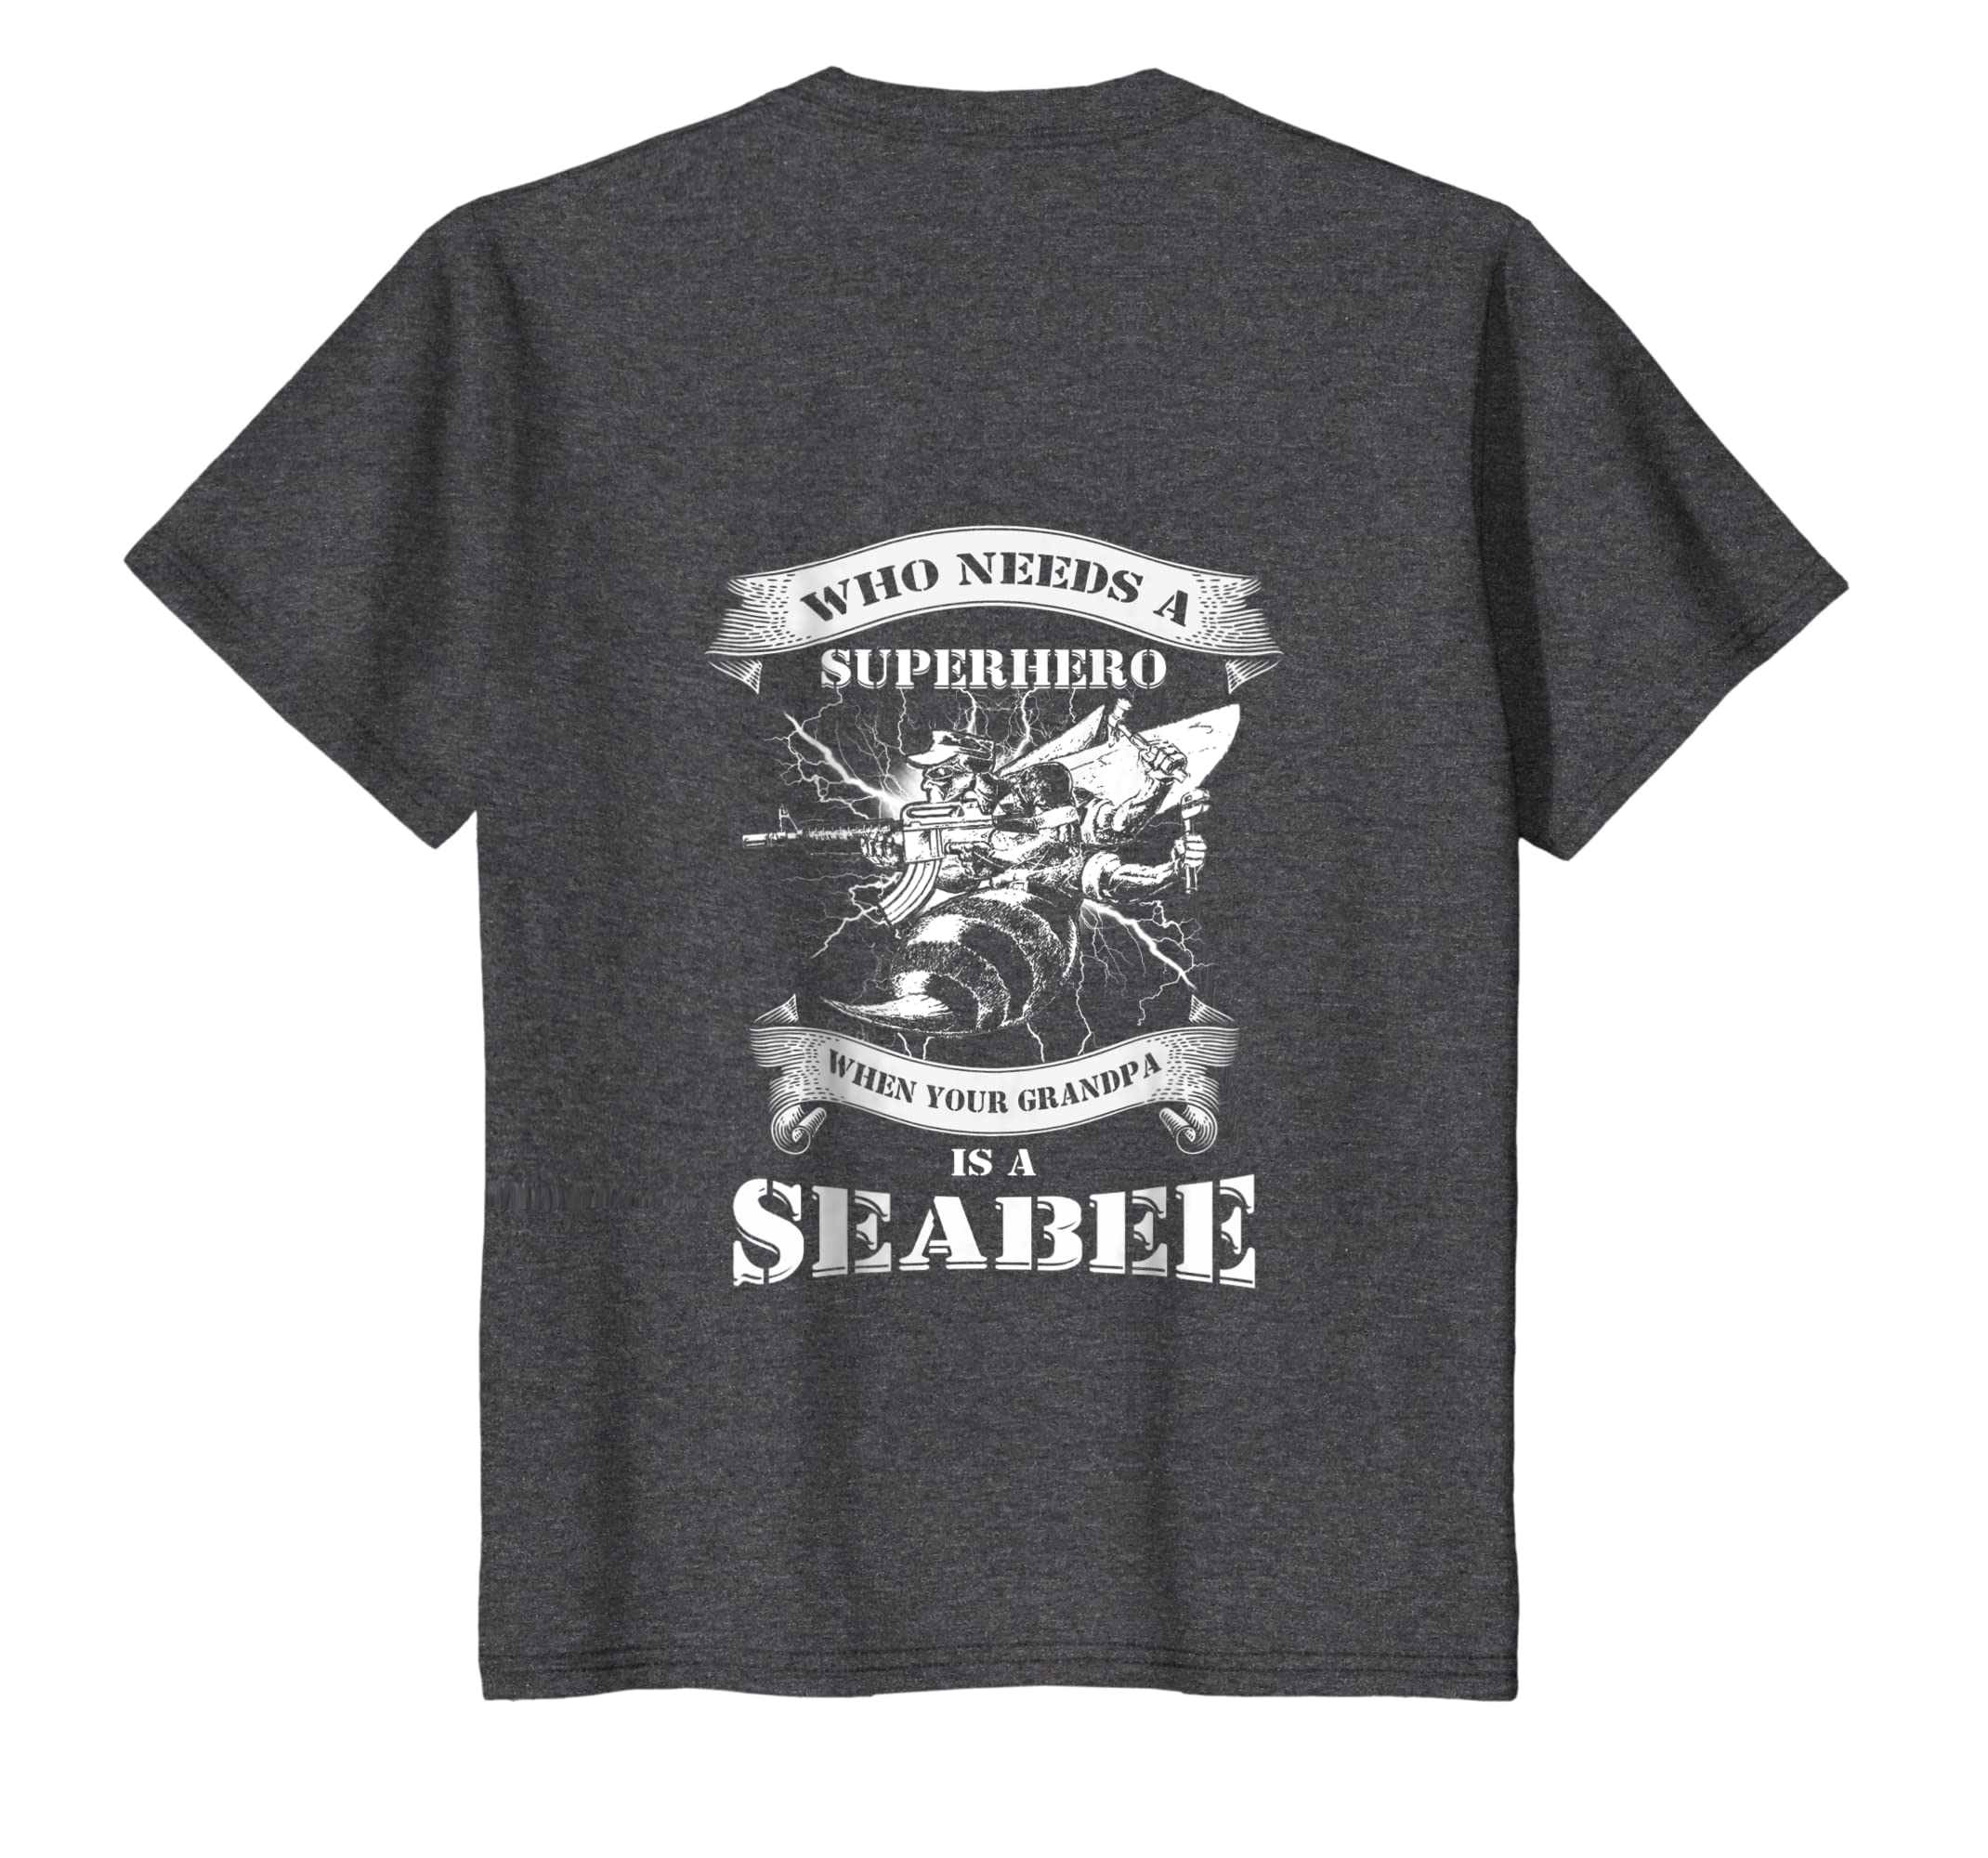 e5ccc2e9 Amazon.com: Who Needs A Superhero When My Grandpa Is A Seabee US Veteran:  Clothing